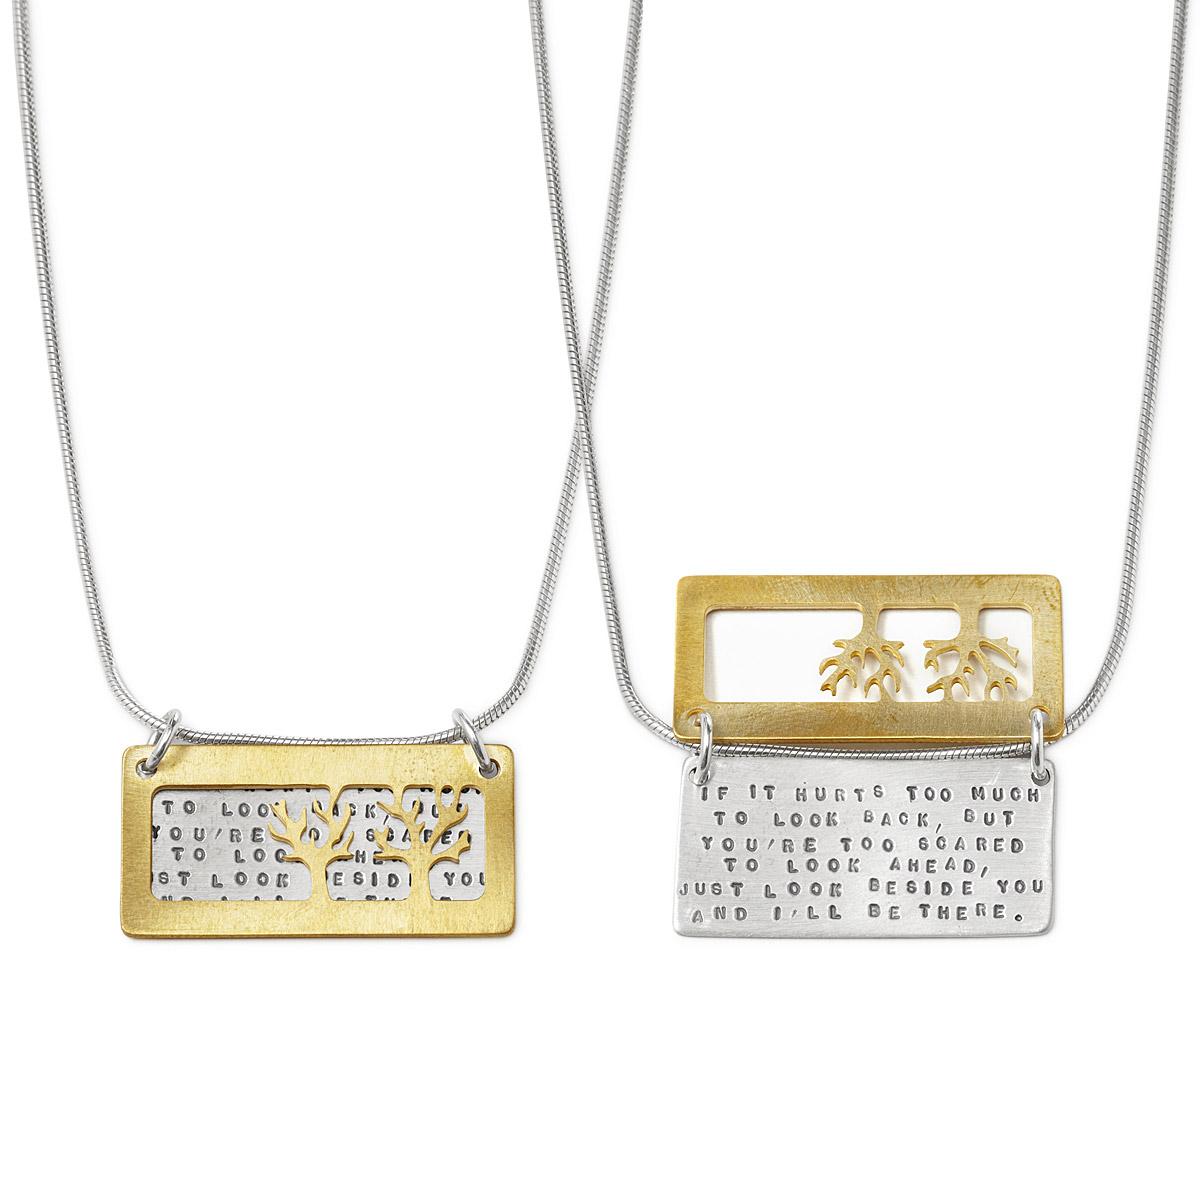 jewelry / necklaces / necklaces